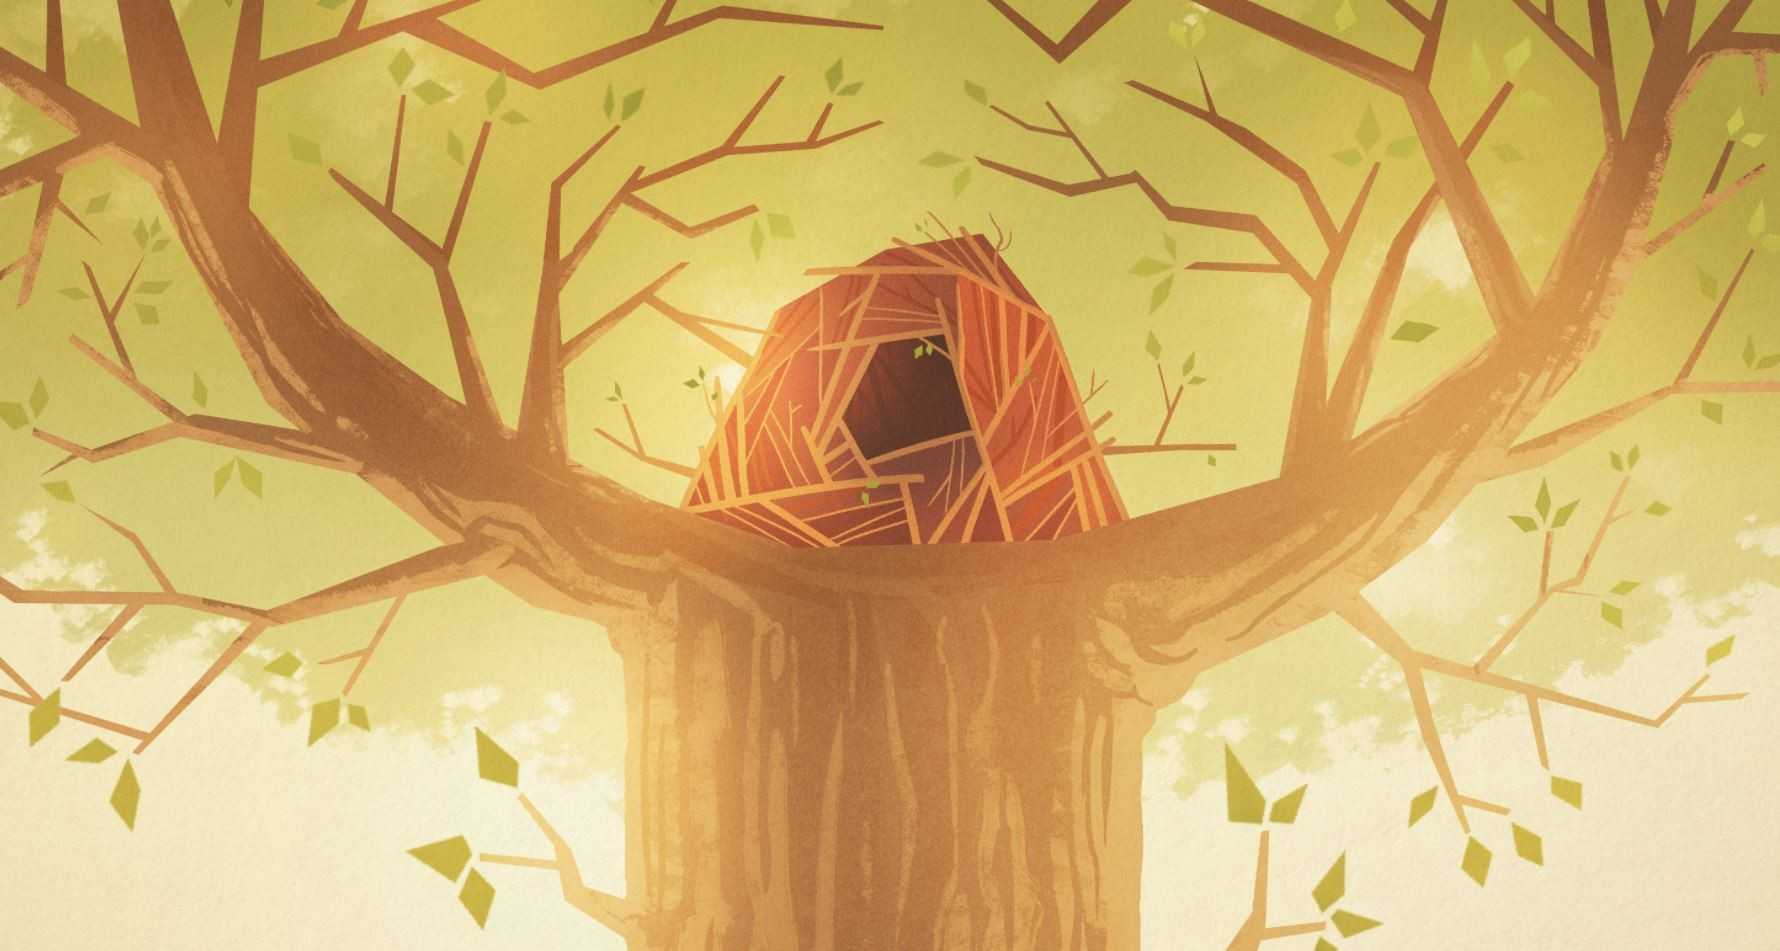 Tiffany sengsavang nest lowres2